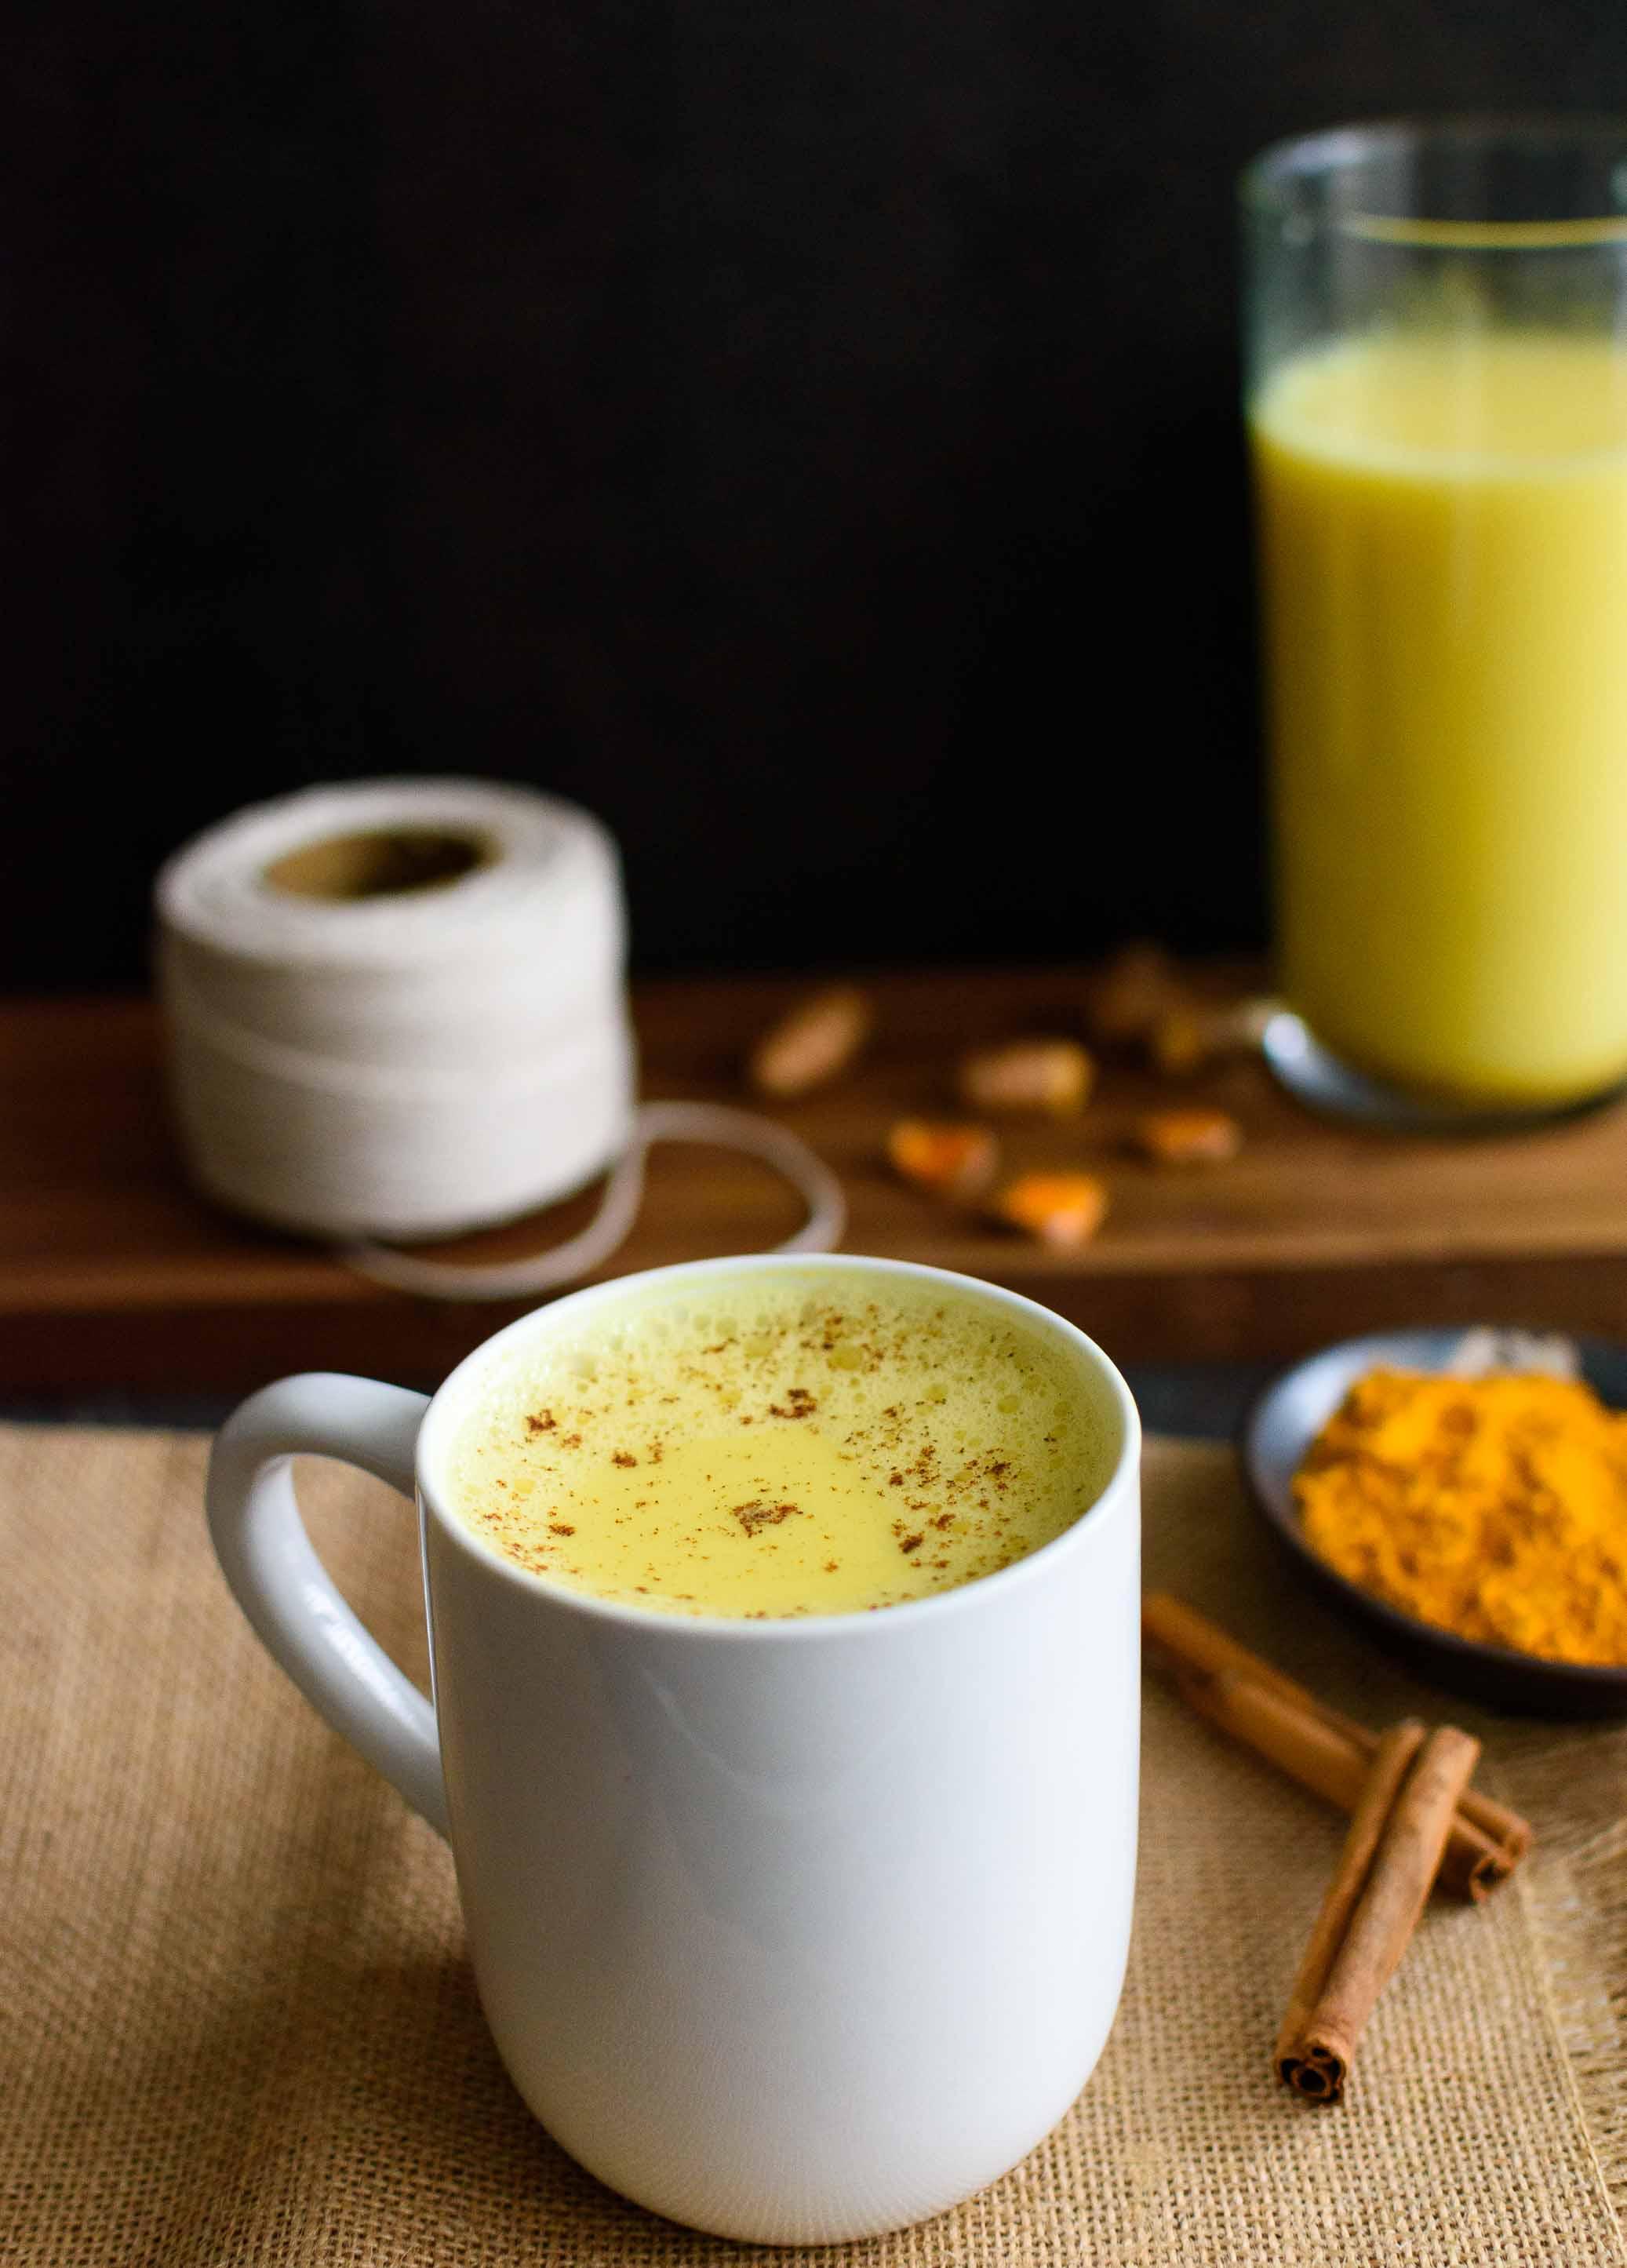 Turmeric Milk- Pepper Delight #pepperdelightblog #recipe #turmericmilk #healthy #turmeric #superfood #2018foodtrend #cleaneating #vegan #glutenfree #breakfast #haldidooth #goldendrink #goldenmilk #indianrecipes #healingdrink #plantbased #detox #drinks #cleansing #curcumin